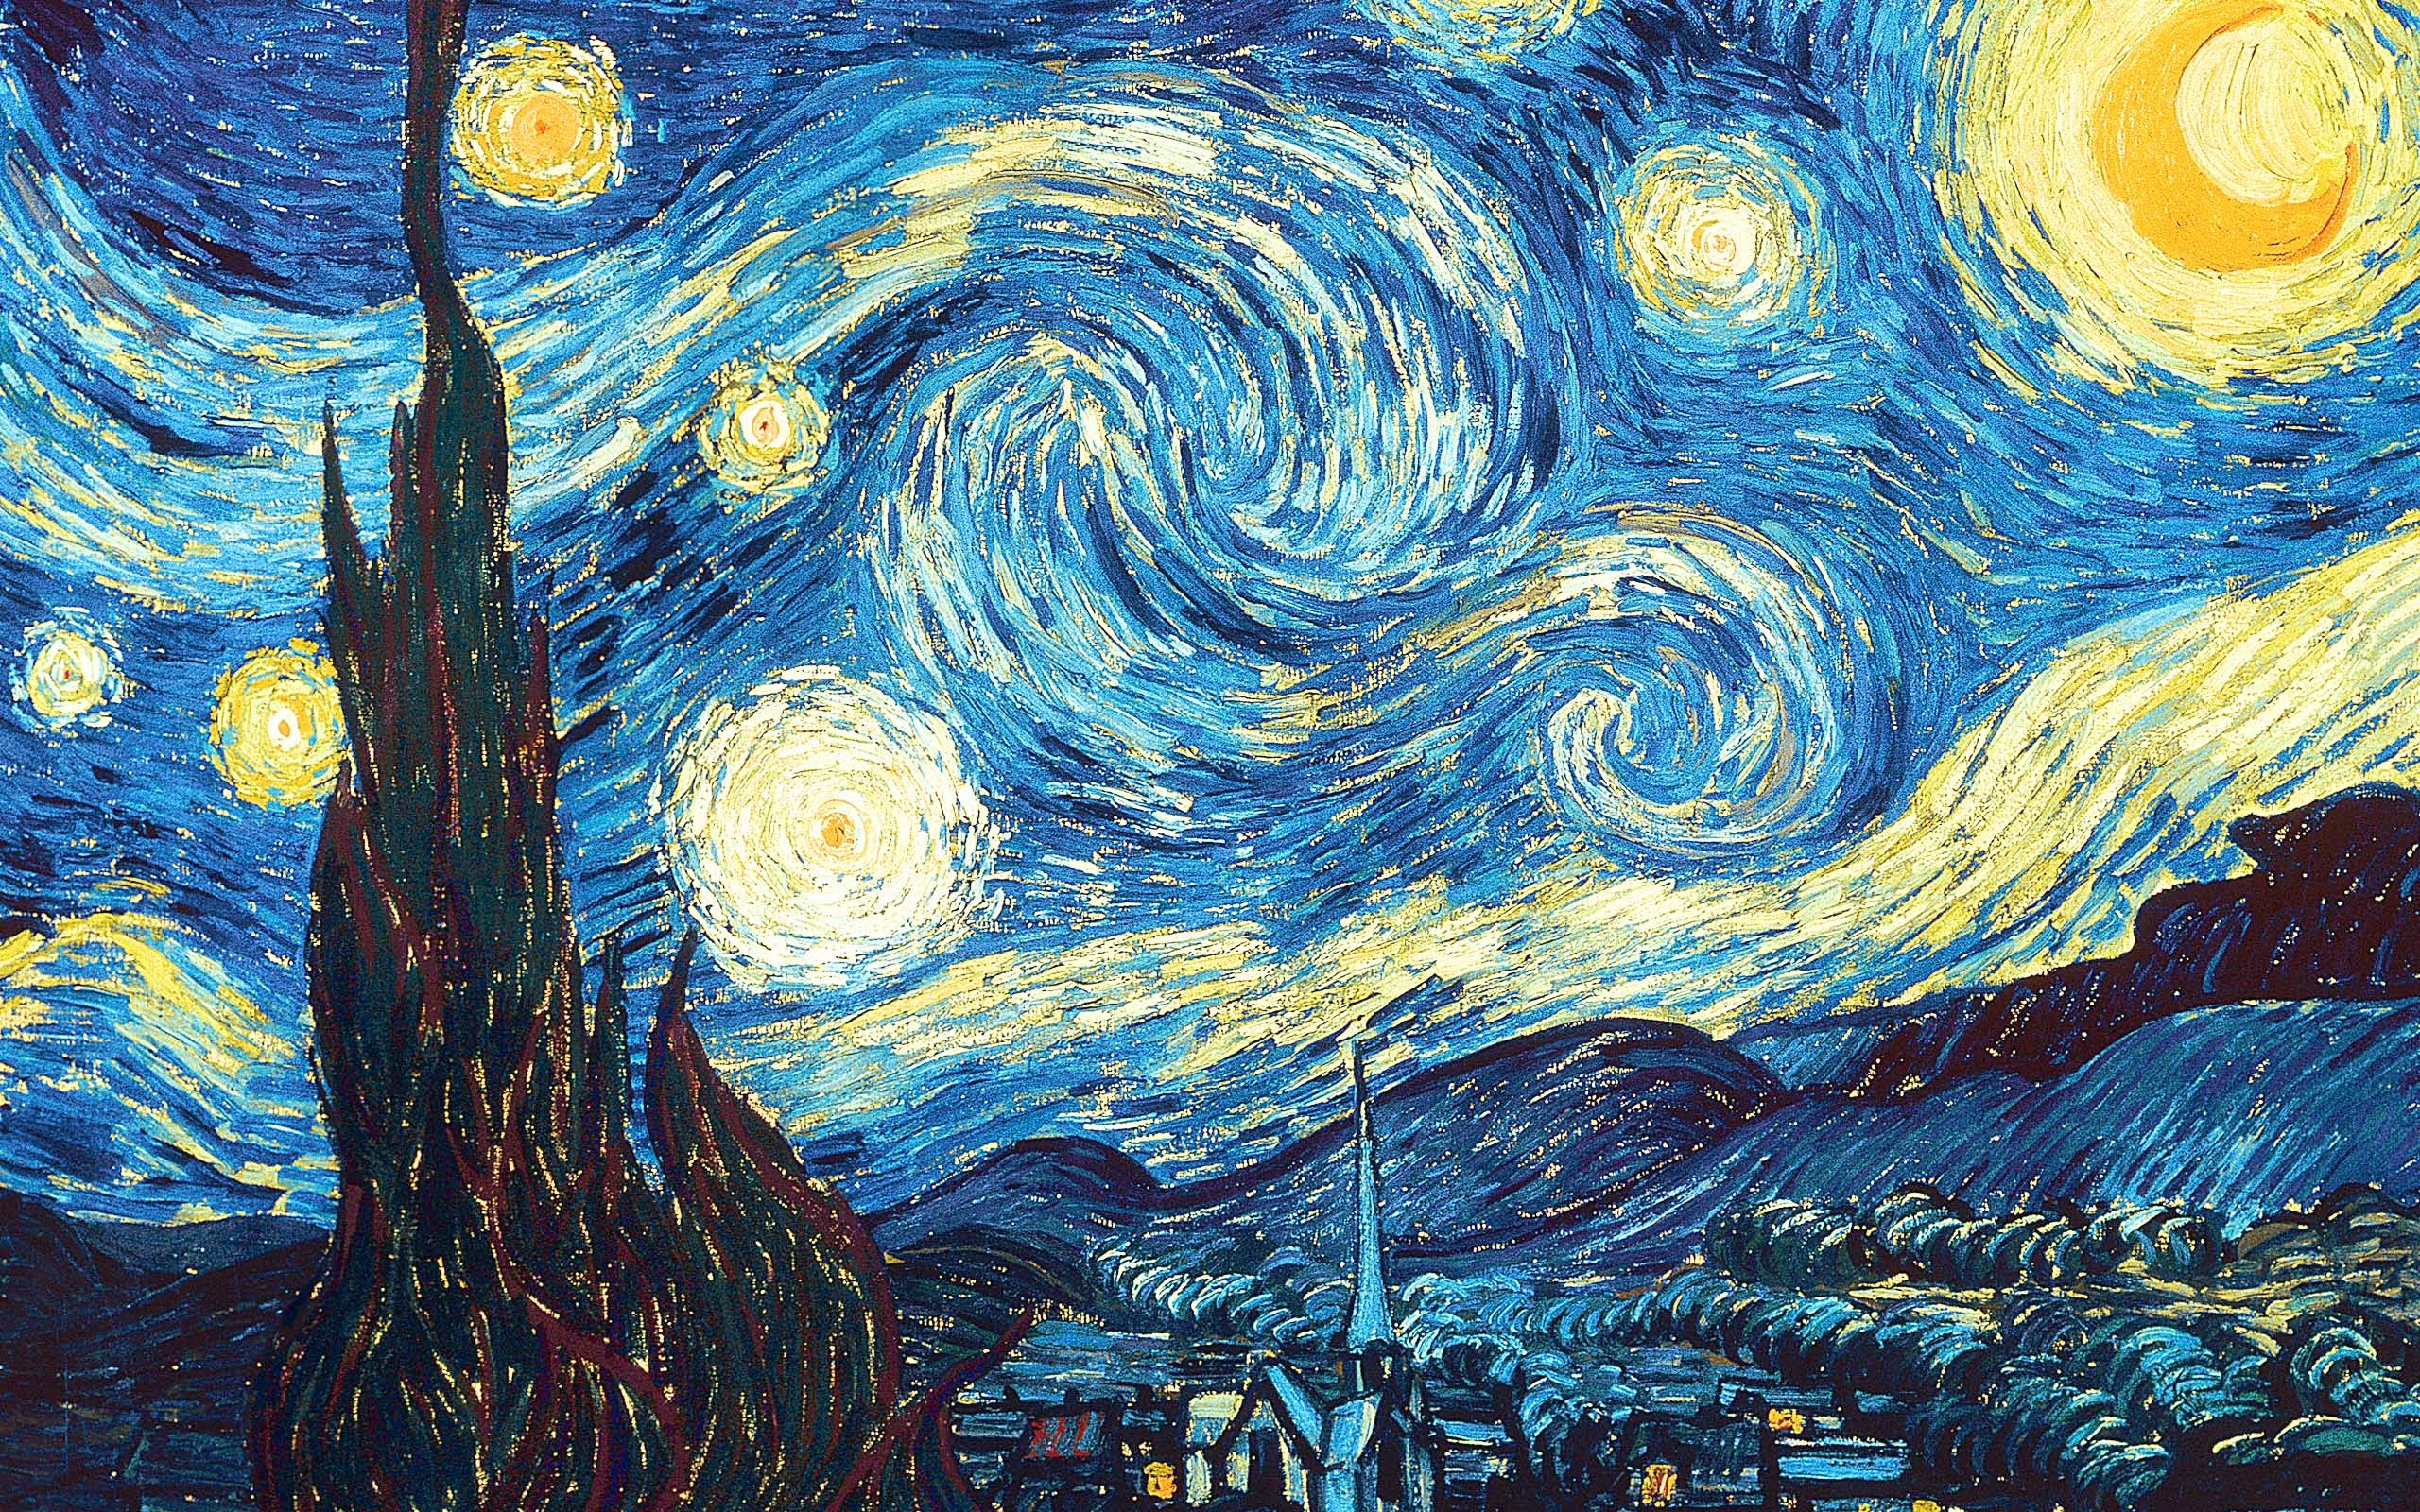 Starry Night Wallpaper Vincent van Gogh Wallpapers 2560x1600